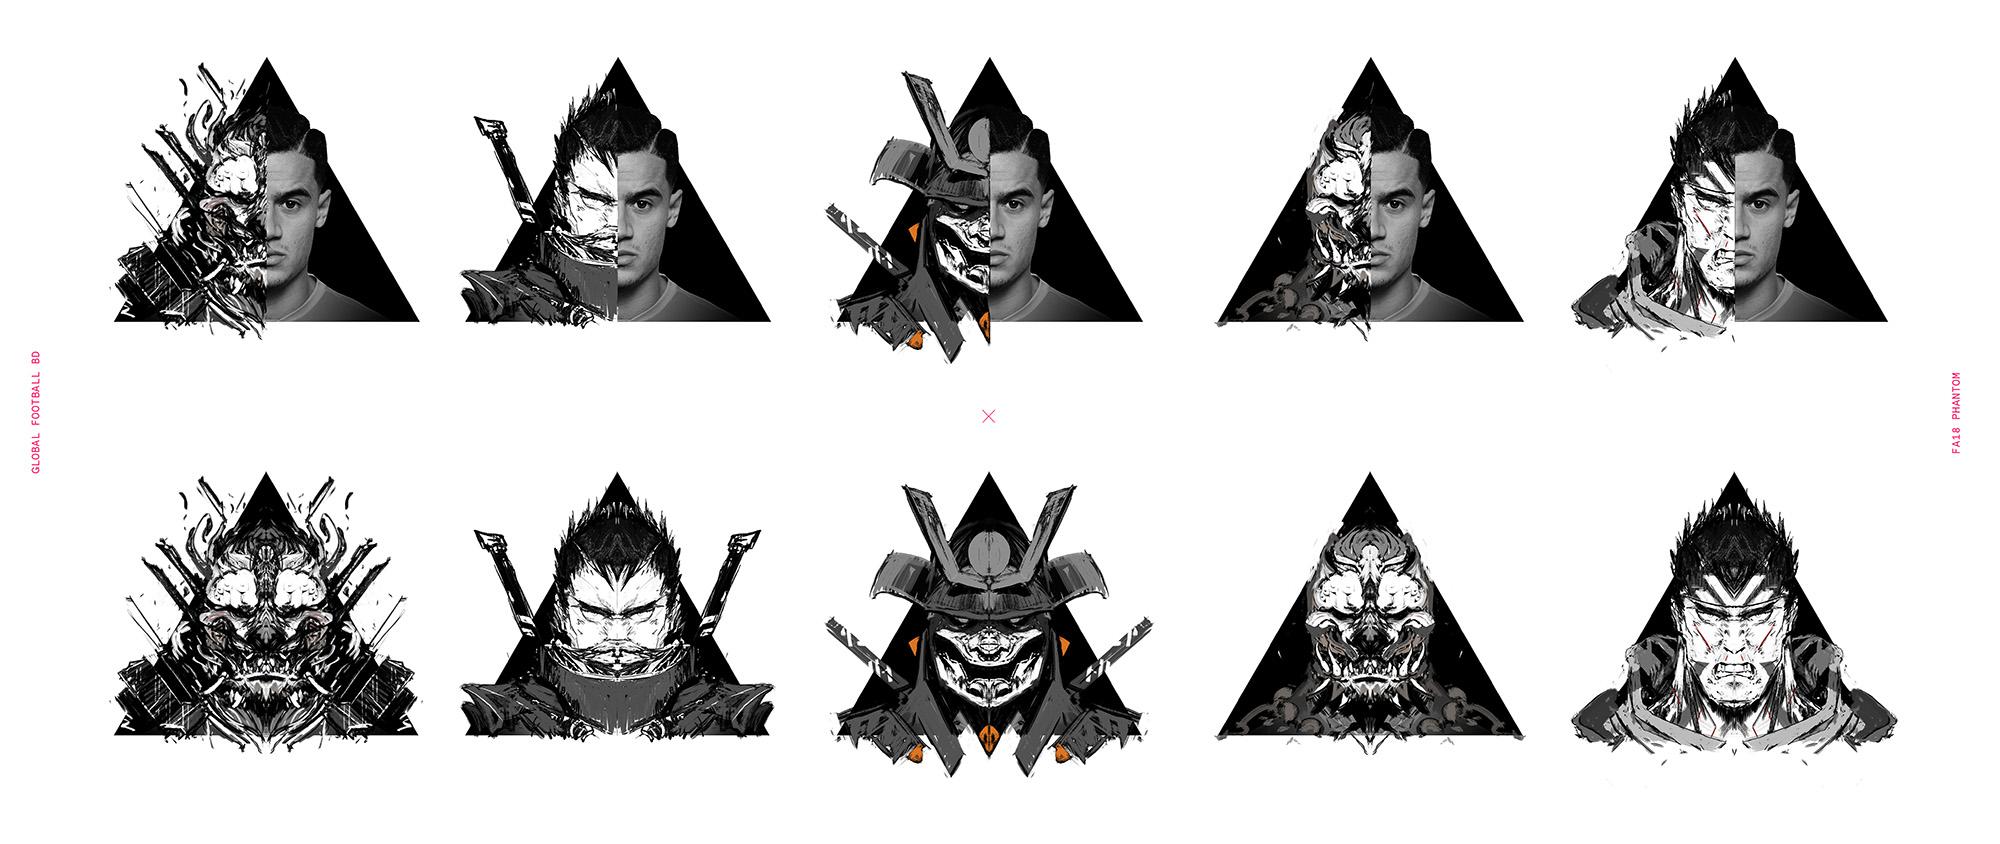 Phantom_Portrait_Warrior_Comp_01_ MK_050519